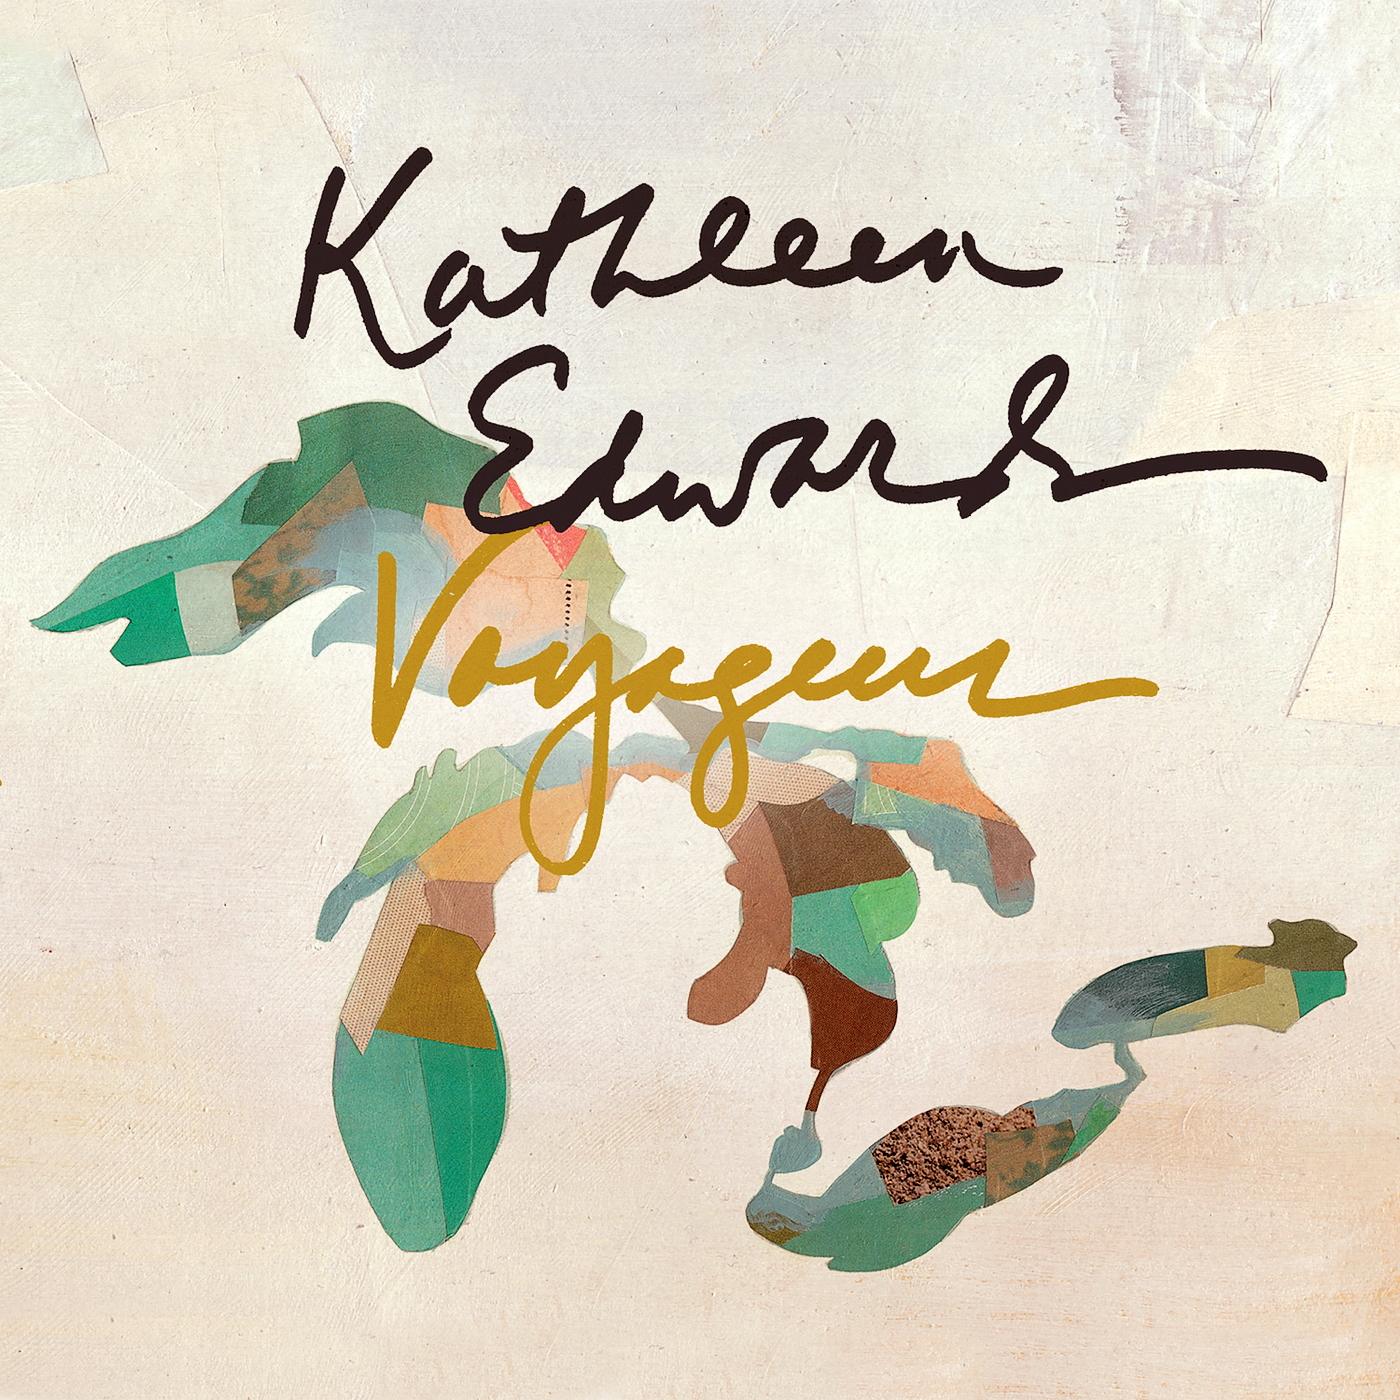 Kathleen Edwards, Voyageur